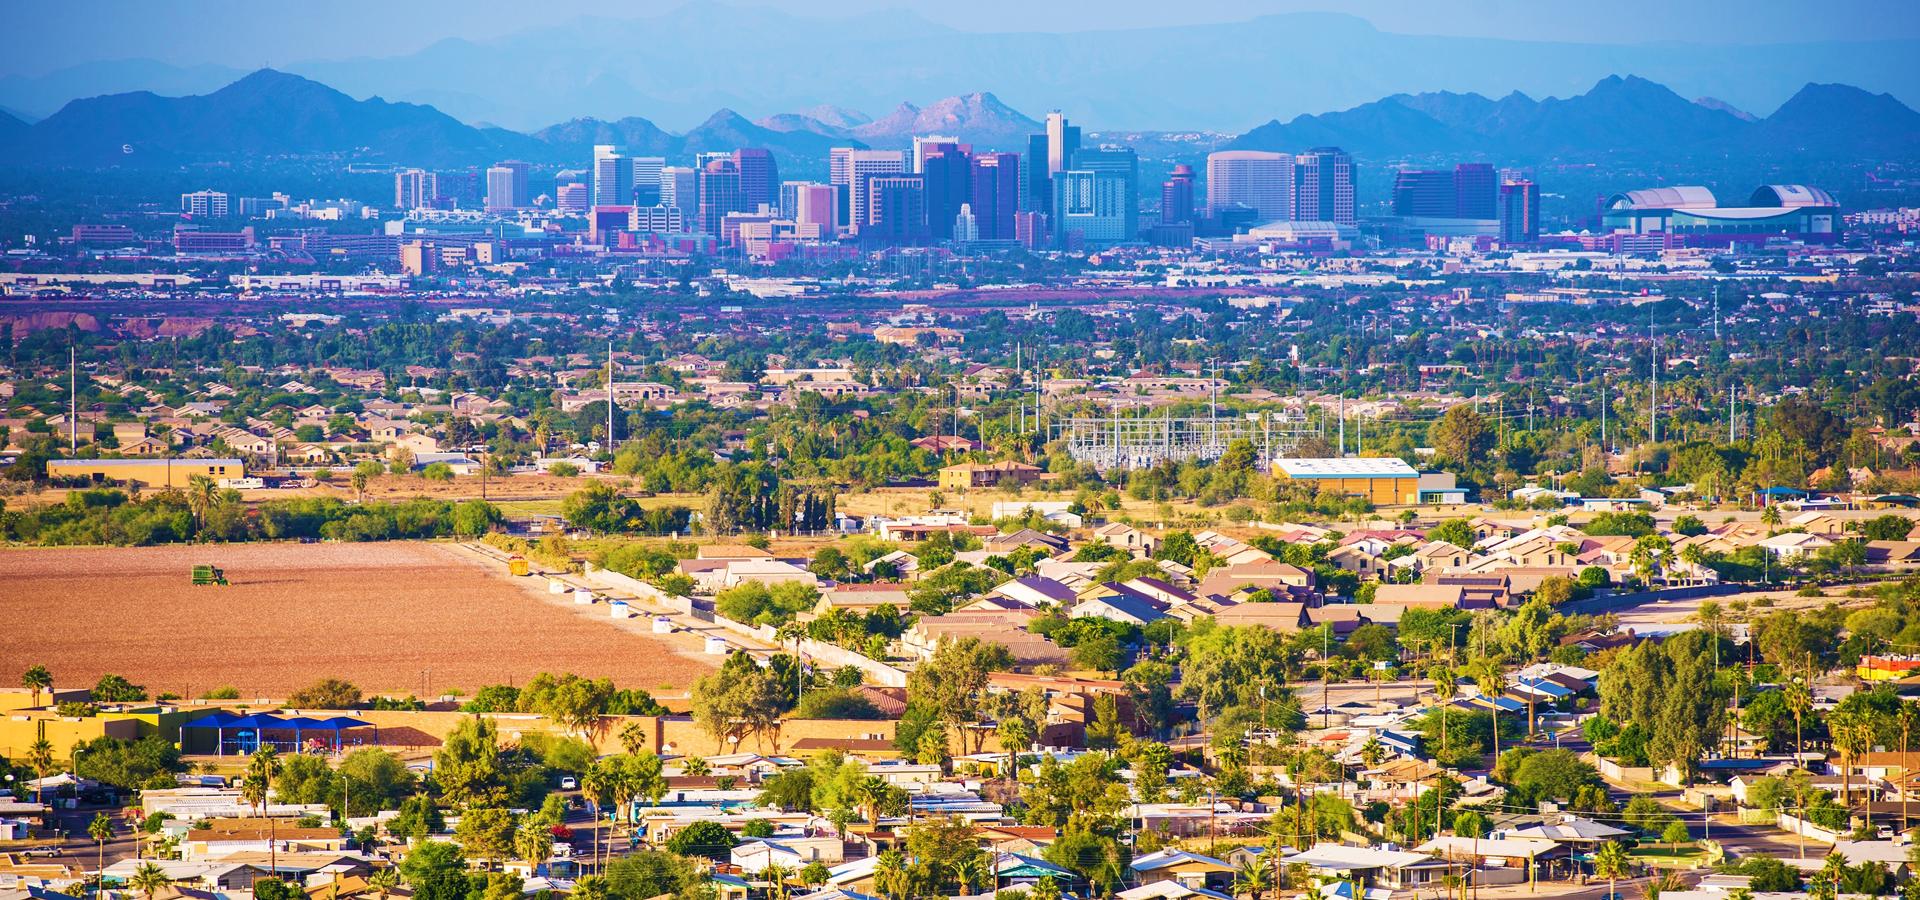 <b>America/Phoenix/Arizona</b>